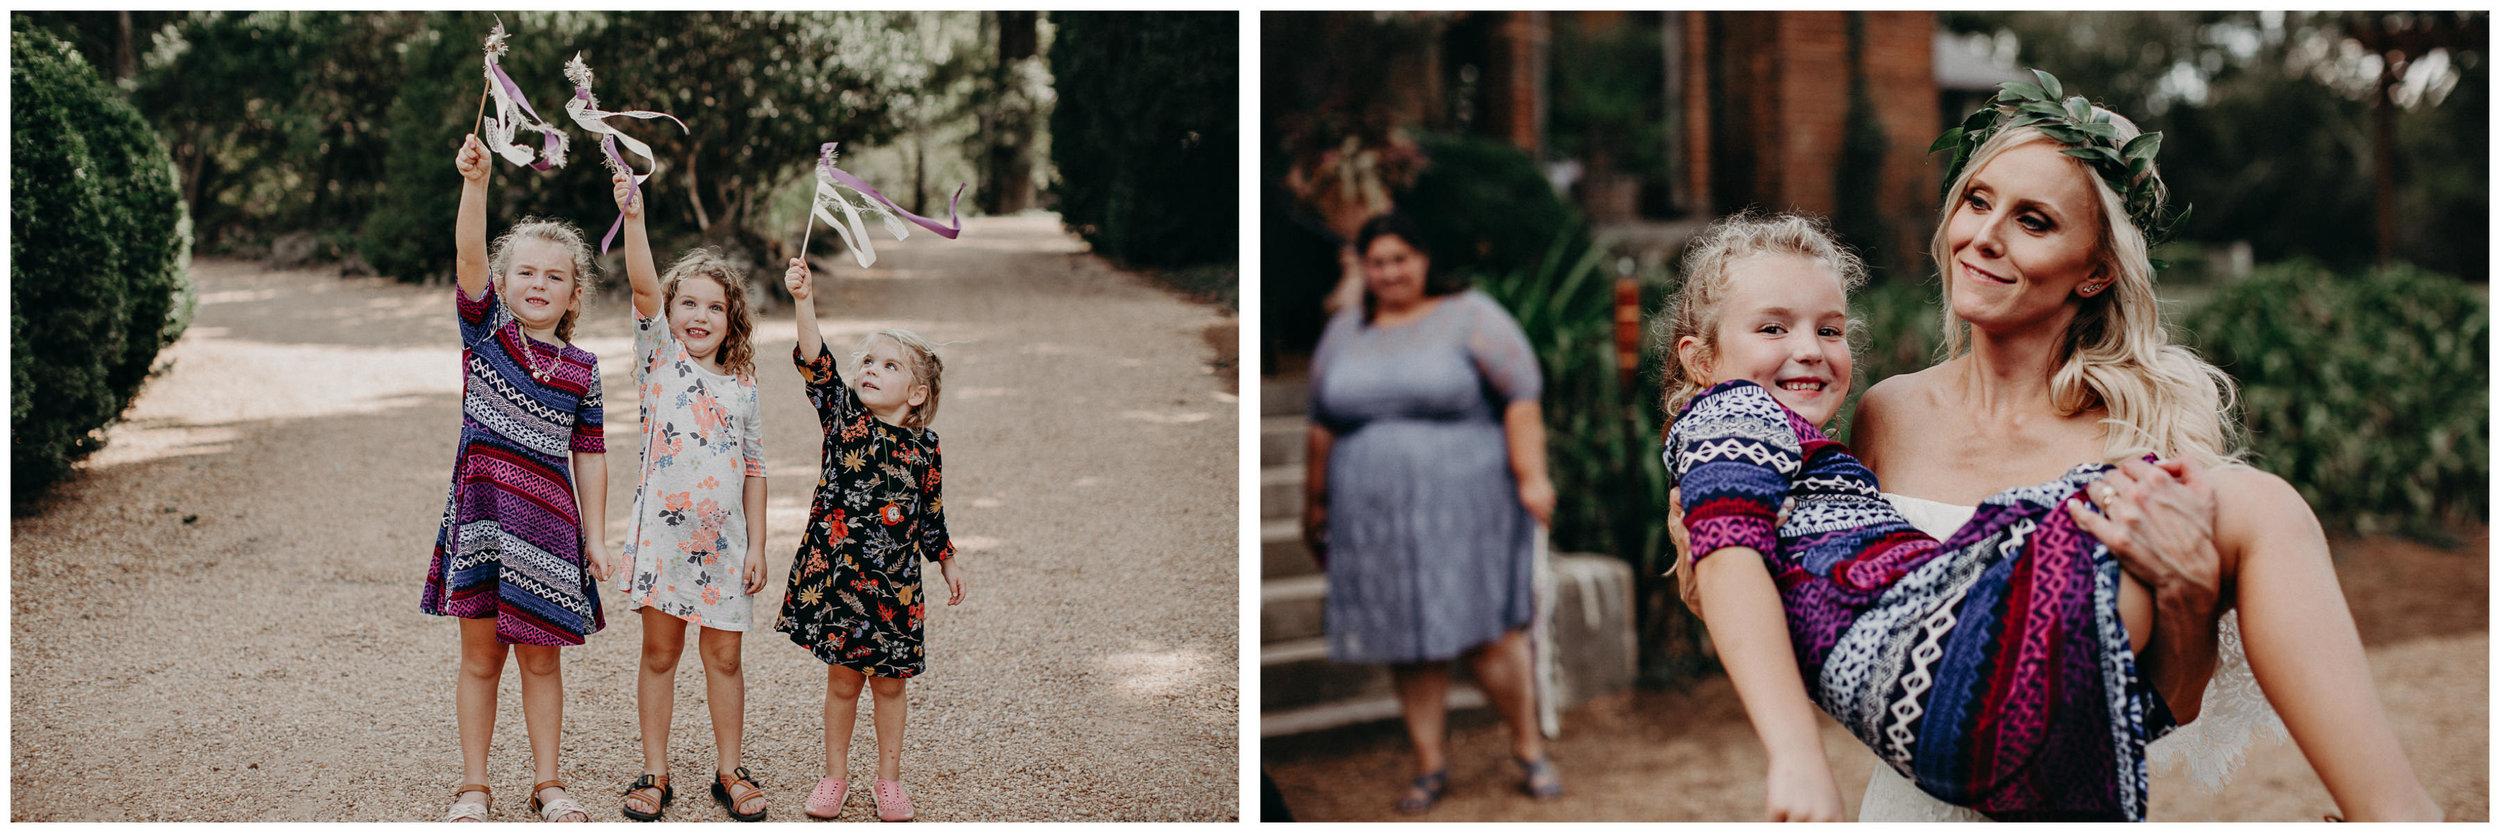 144 - Barnsley Gardens Wedding -Bride and groom portraits - Atlanta wedding photographer .jpg